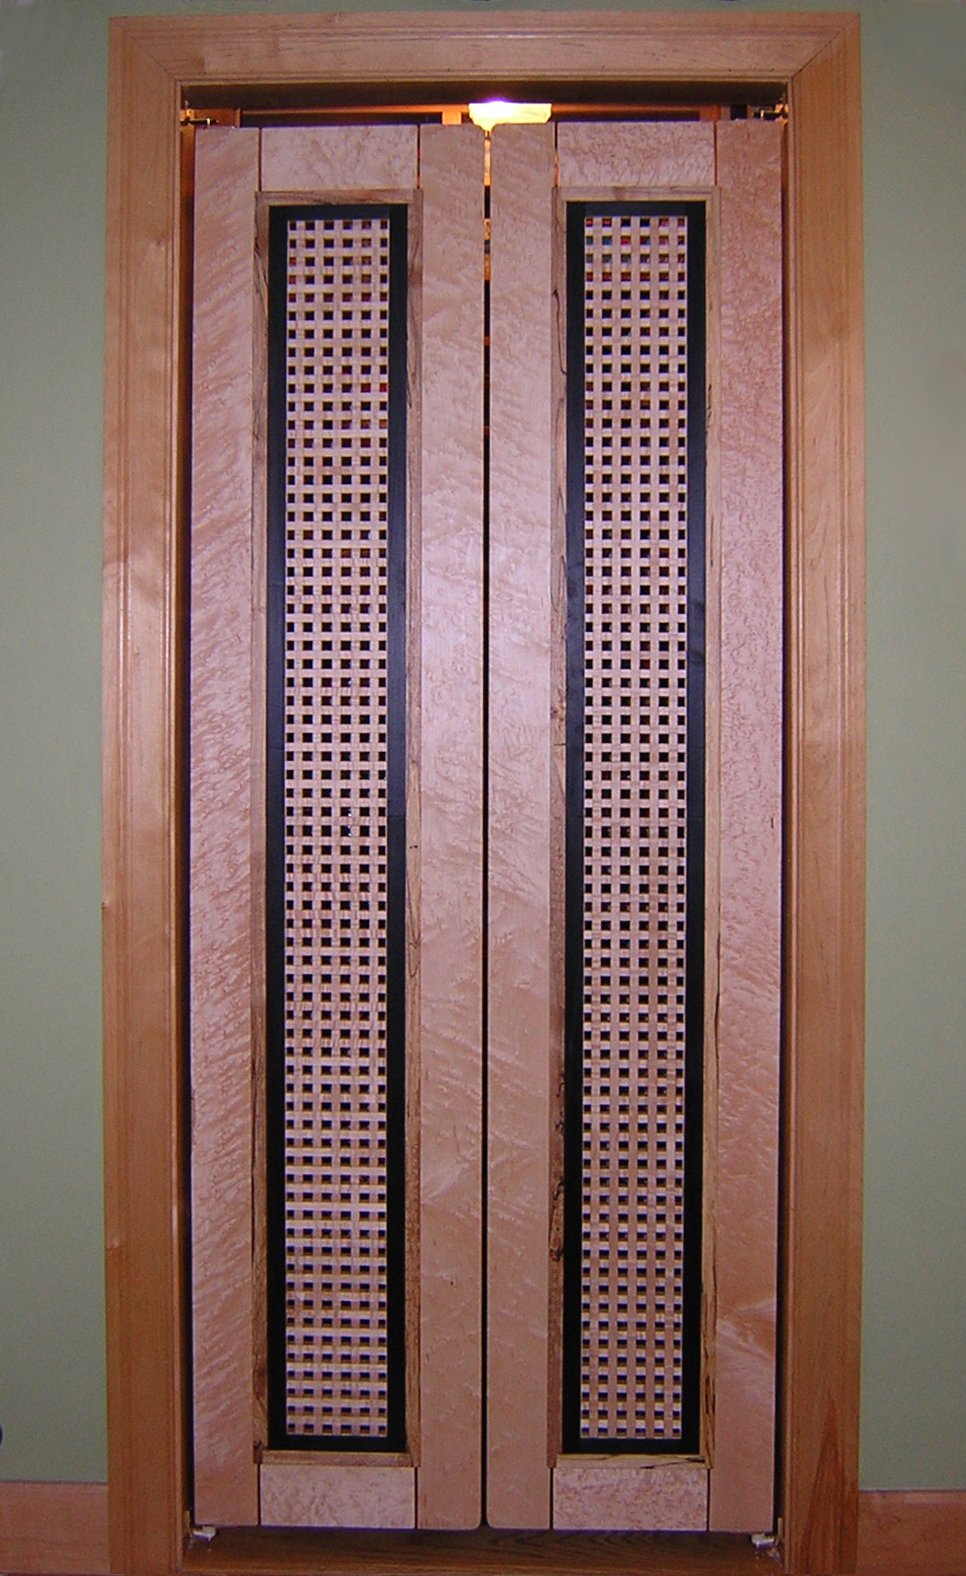 Half Inch Grid Design, Sw Drs for Pantry